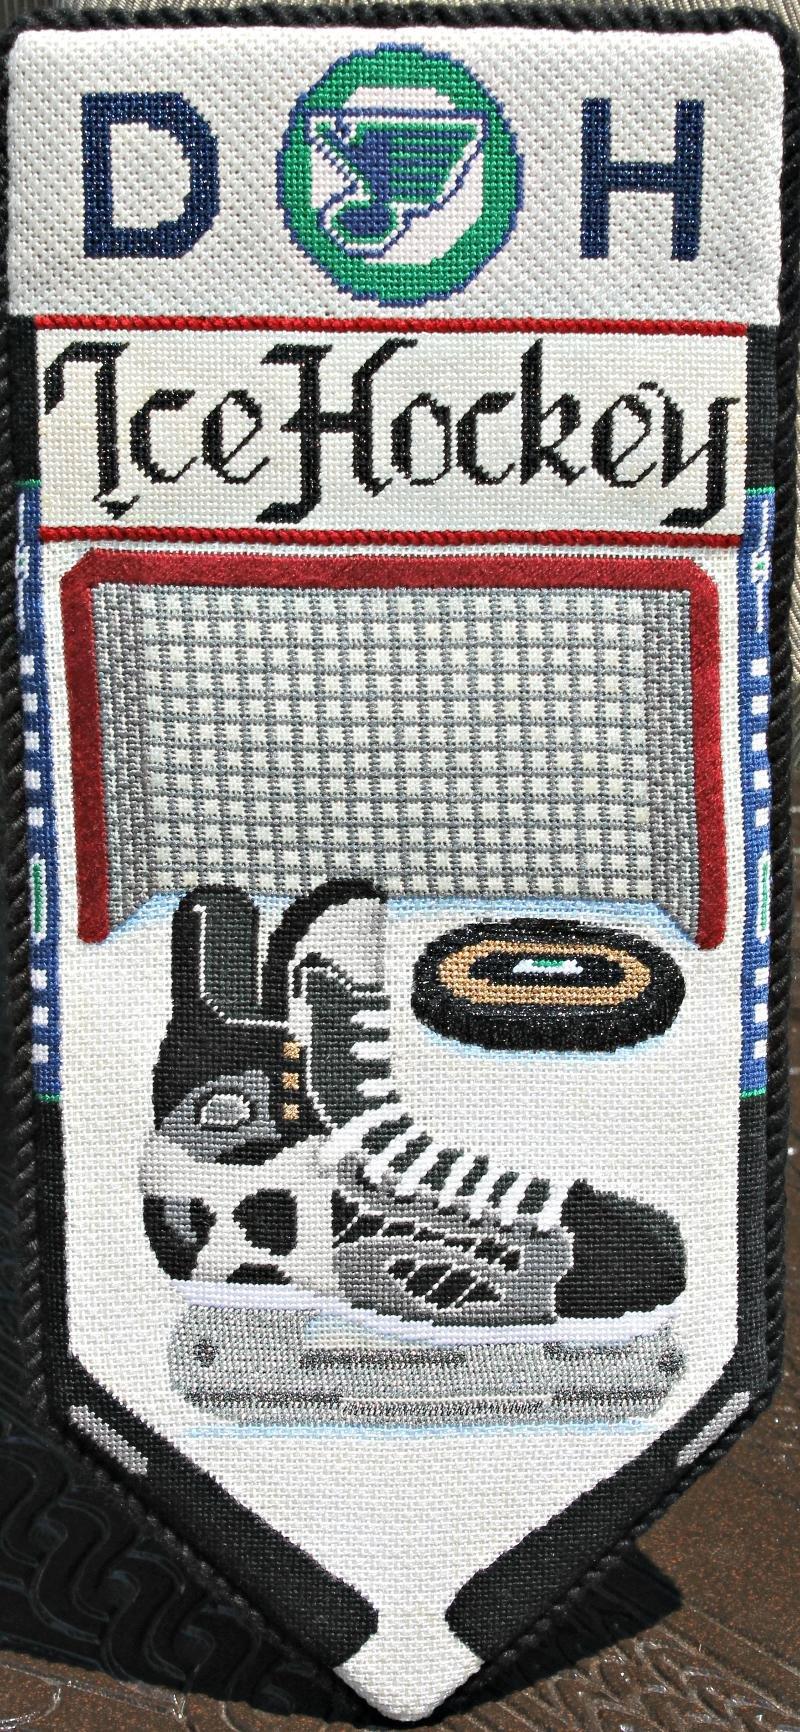 Drew's Hockey Banner